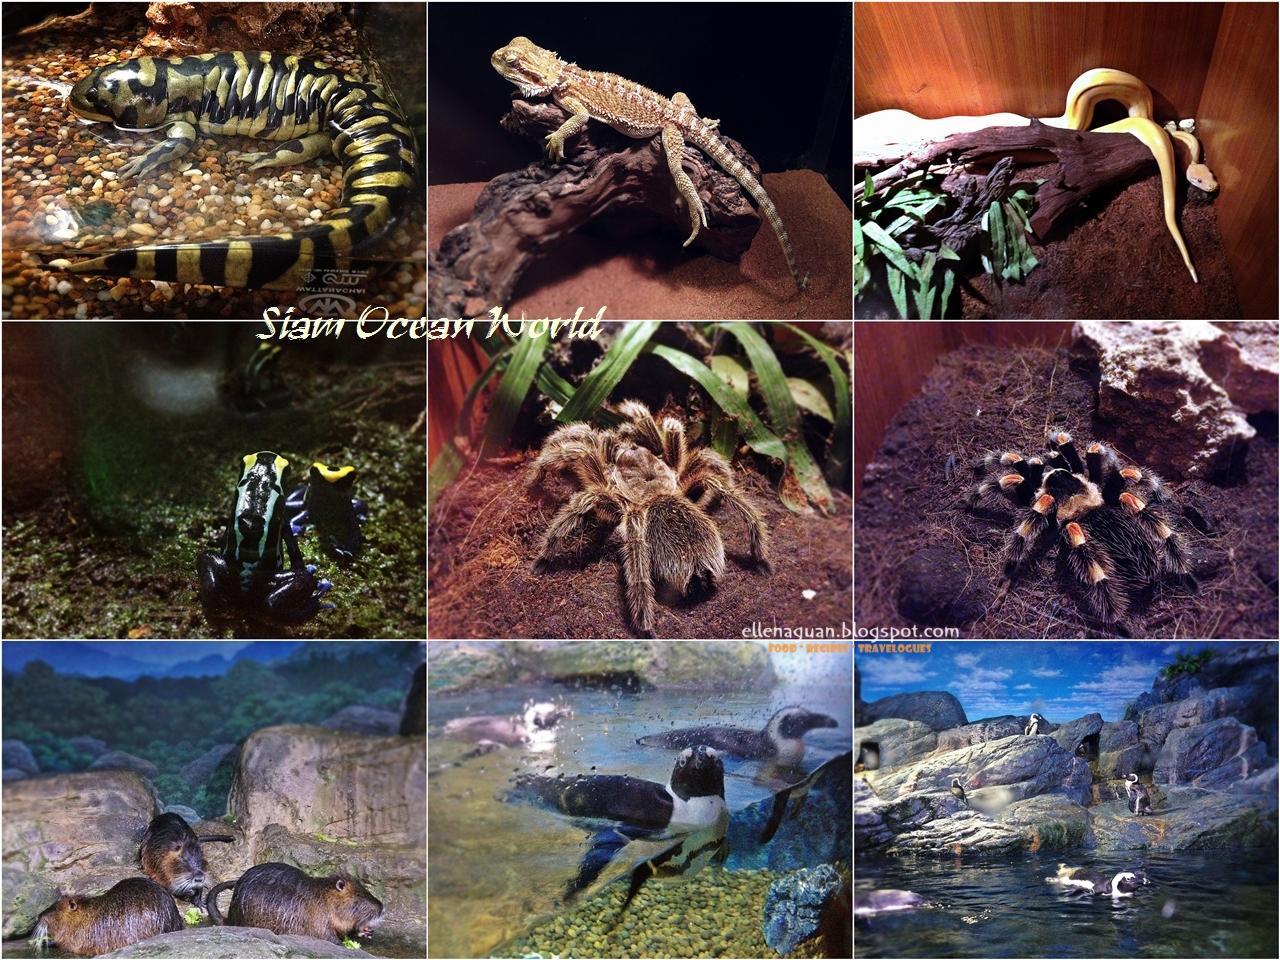 Cuisine Paradise Singapore Food Blog Recipes Reviews And Travel Thailand Et Ticket Sea Life Ocean World Aquarium Only Adult Siam Zone 4 Rainforest 5 Rocky Shore